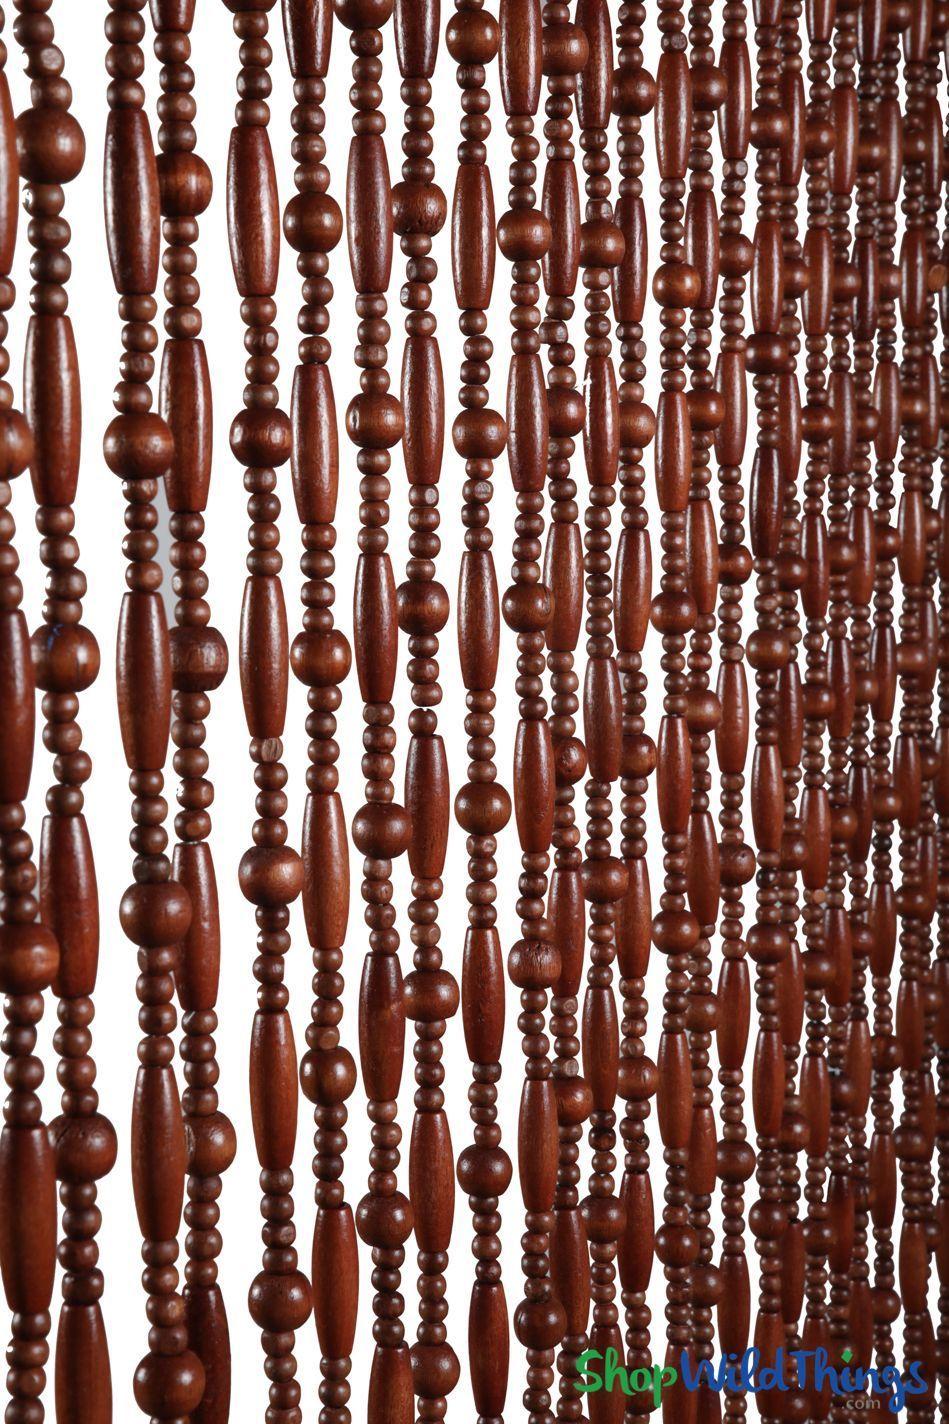 Wooden Bead Curtain Sunnyvale Dark Brown 35 X 78 31 Strands Beaded Curtains Curtains Beaded Door Curtains